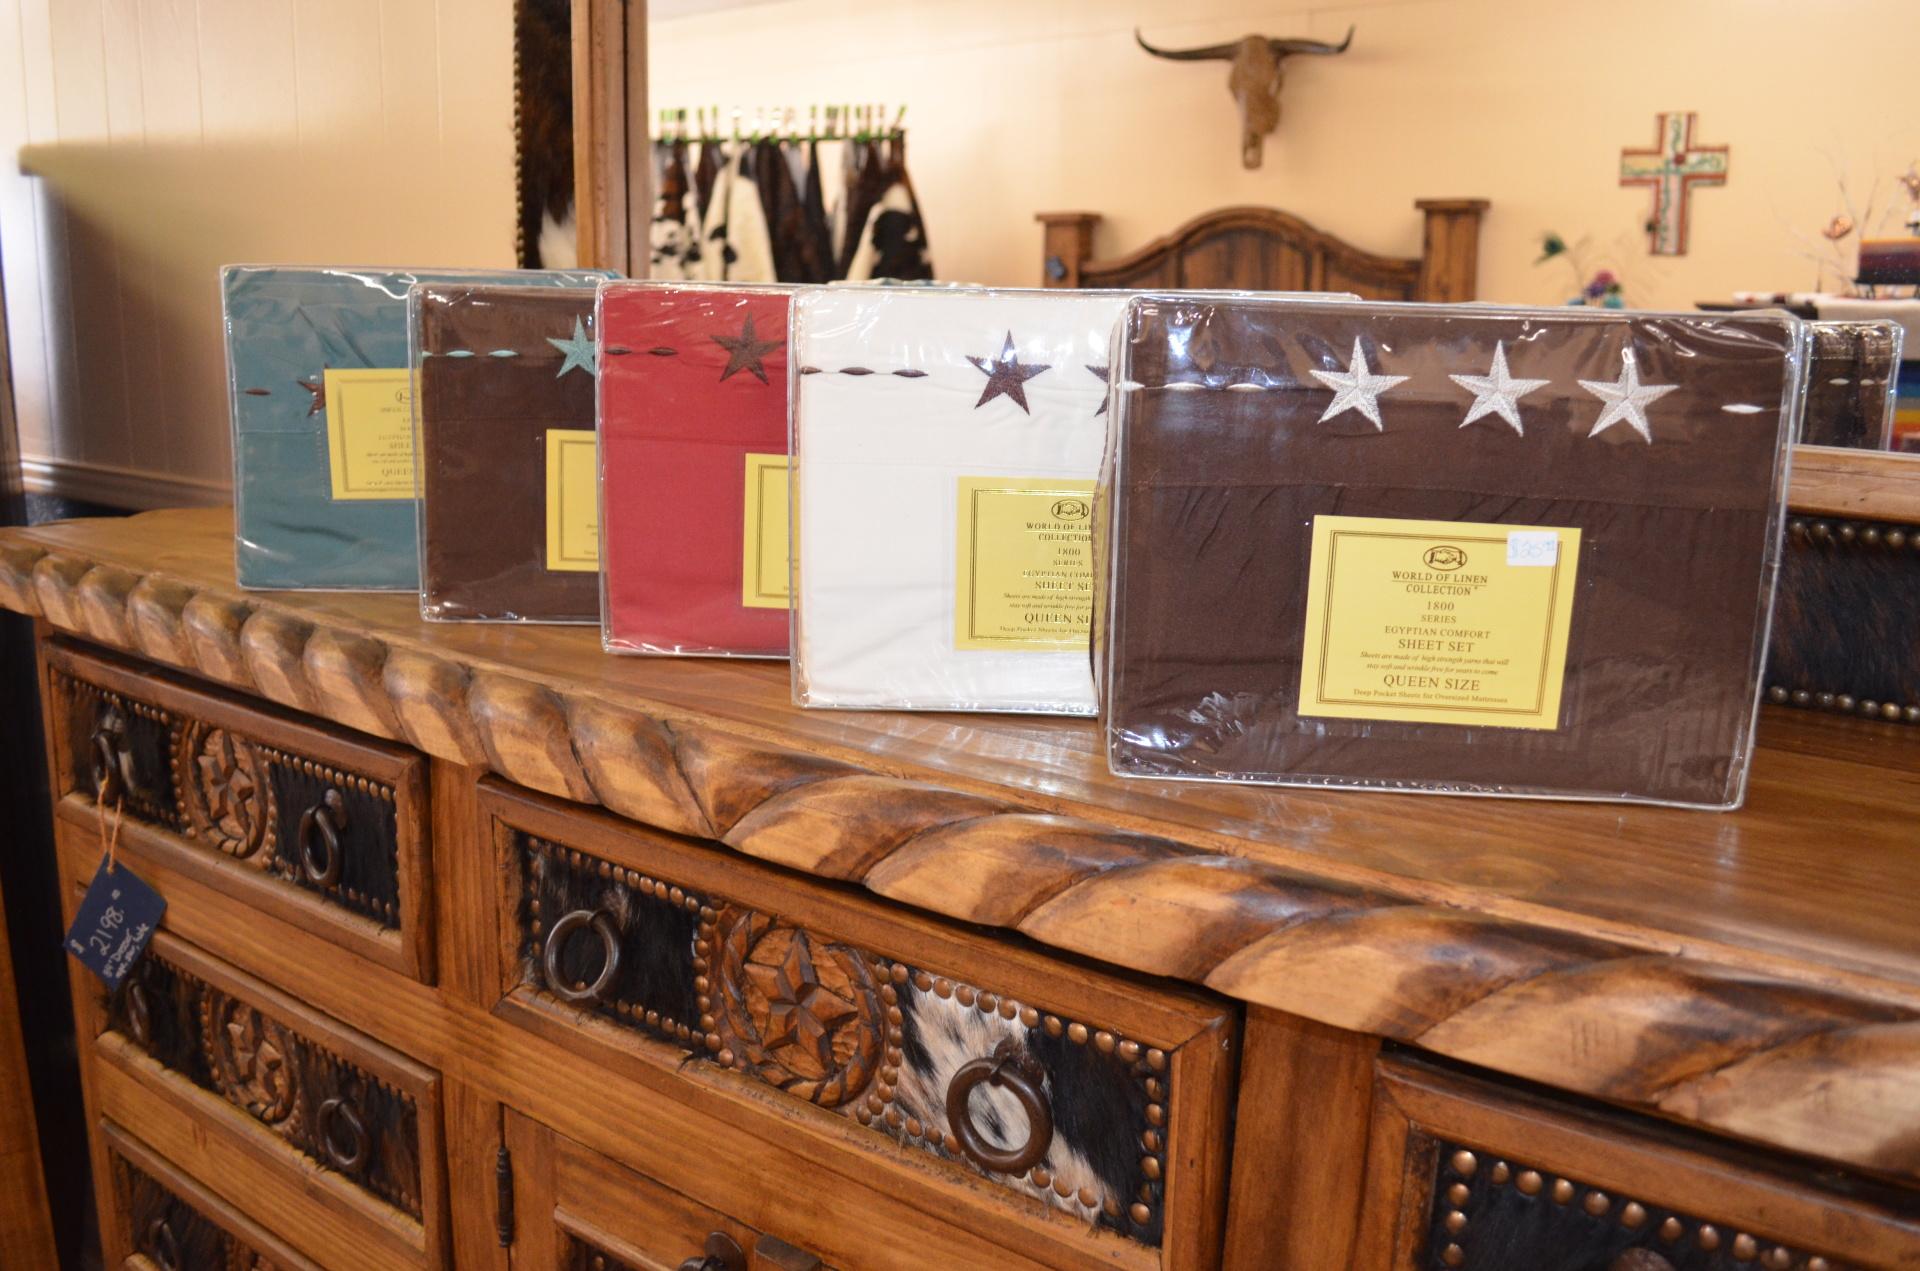 1800 Egyptian Series Sheets- $25.99